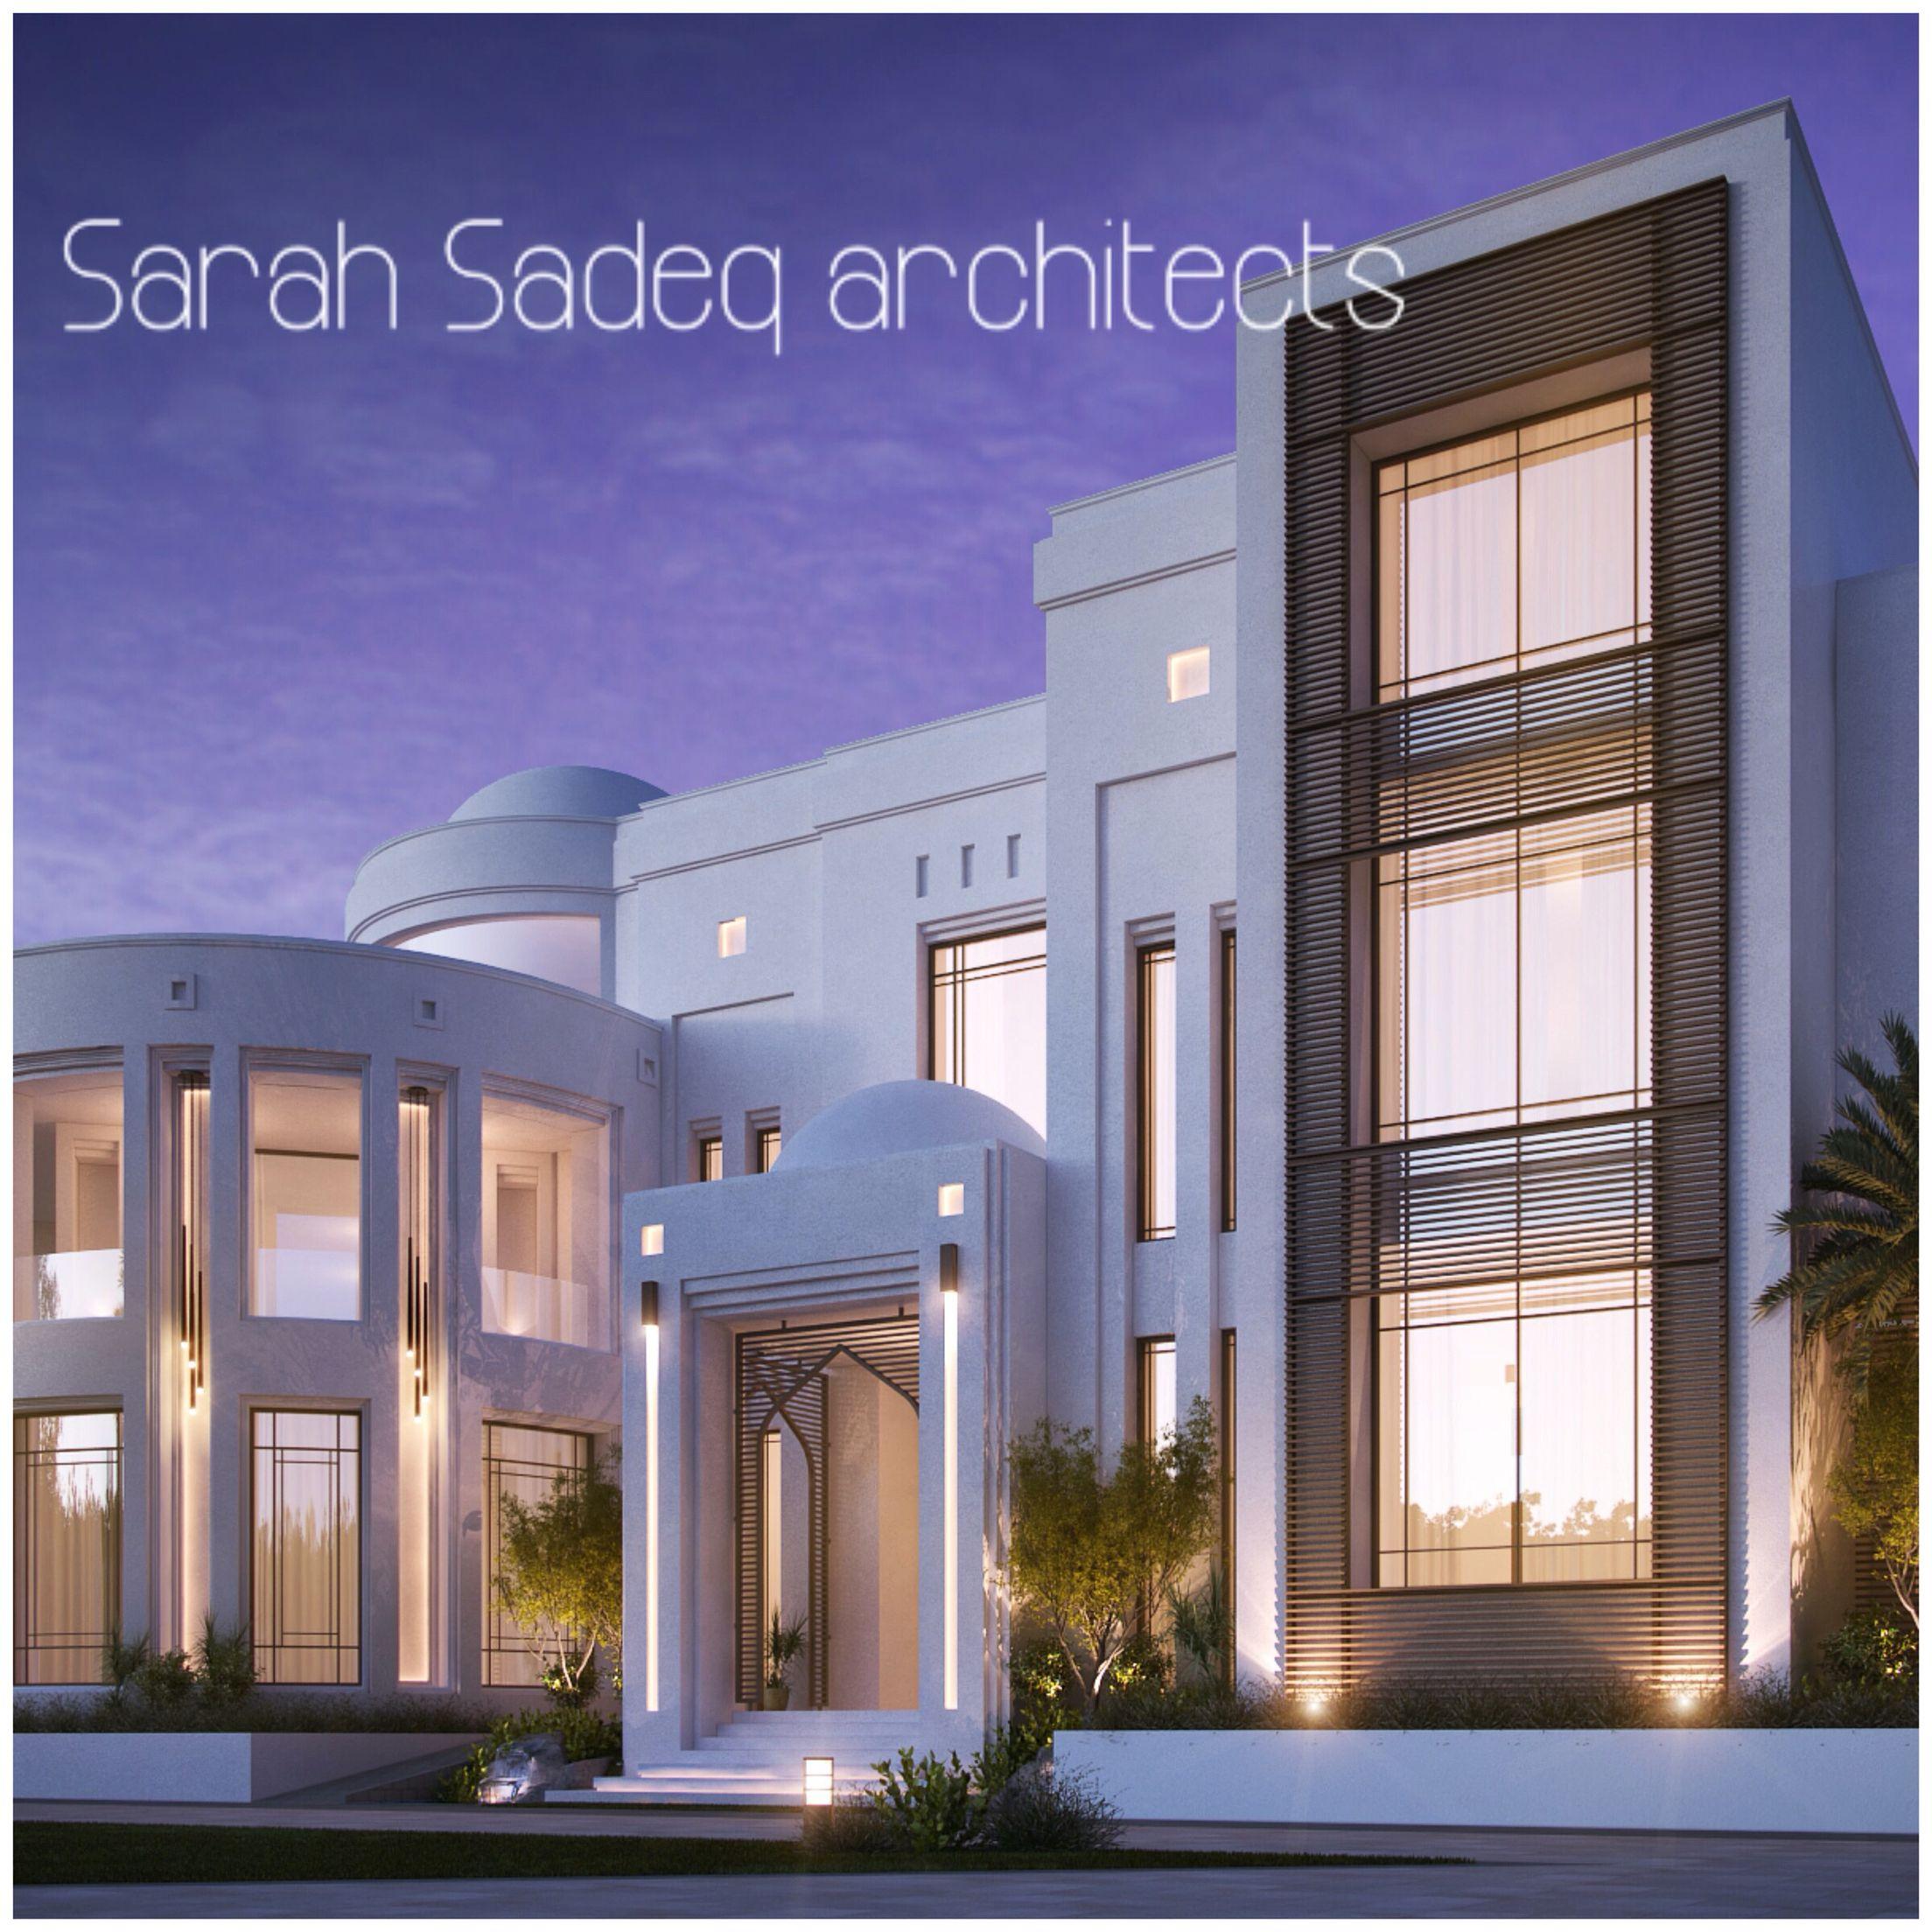 2000 Private Villa Kuwait Sarah Sadeq Architectes